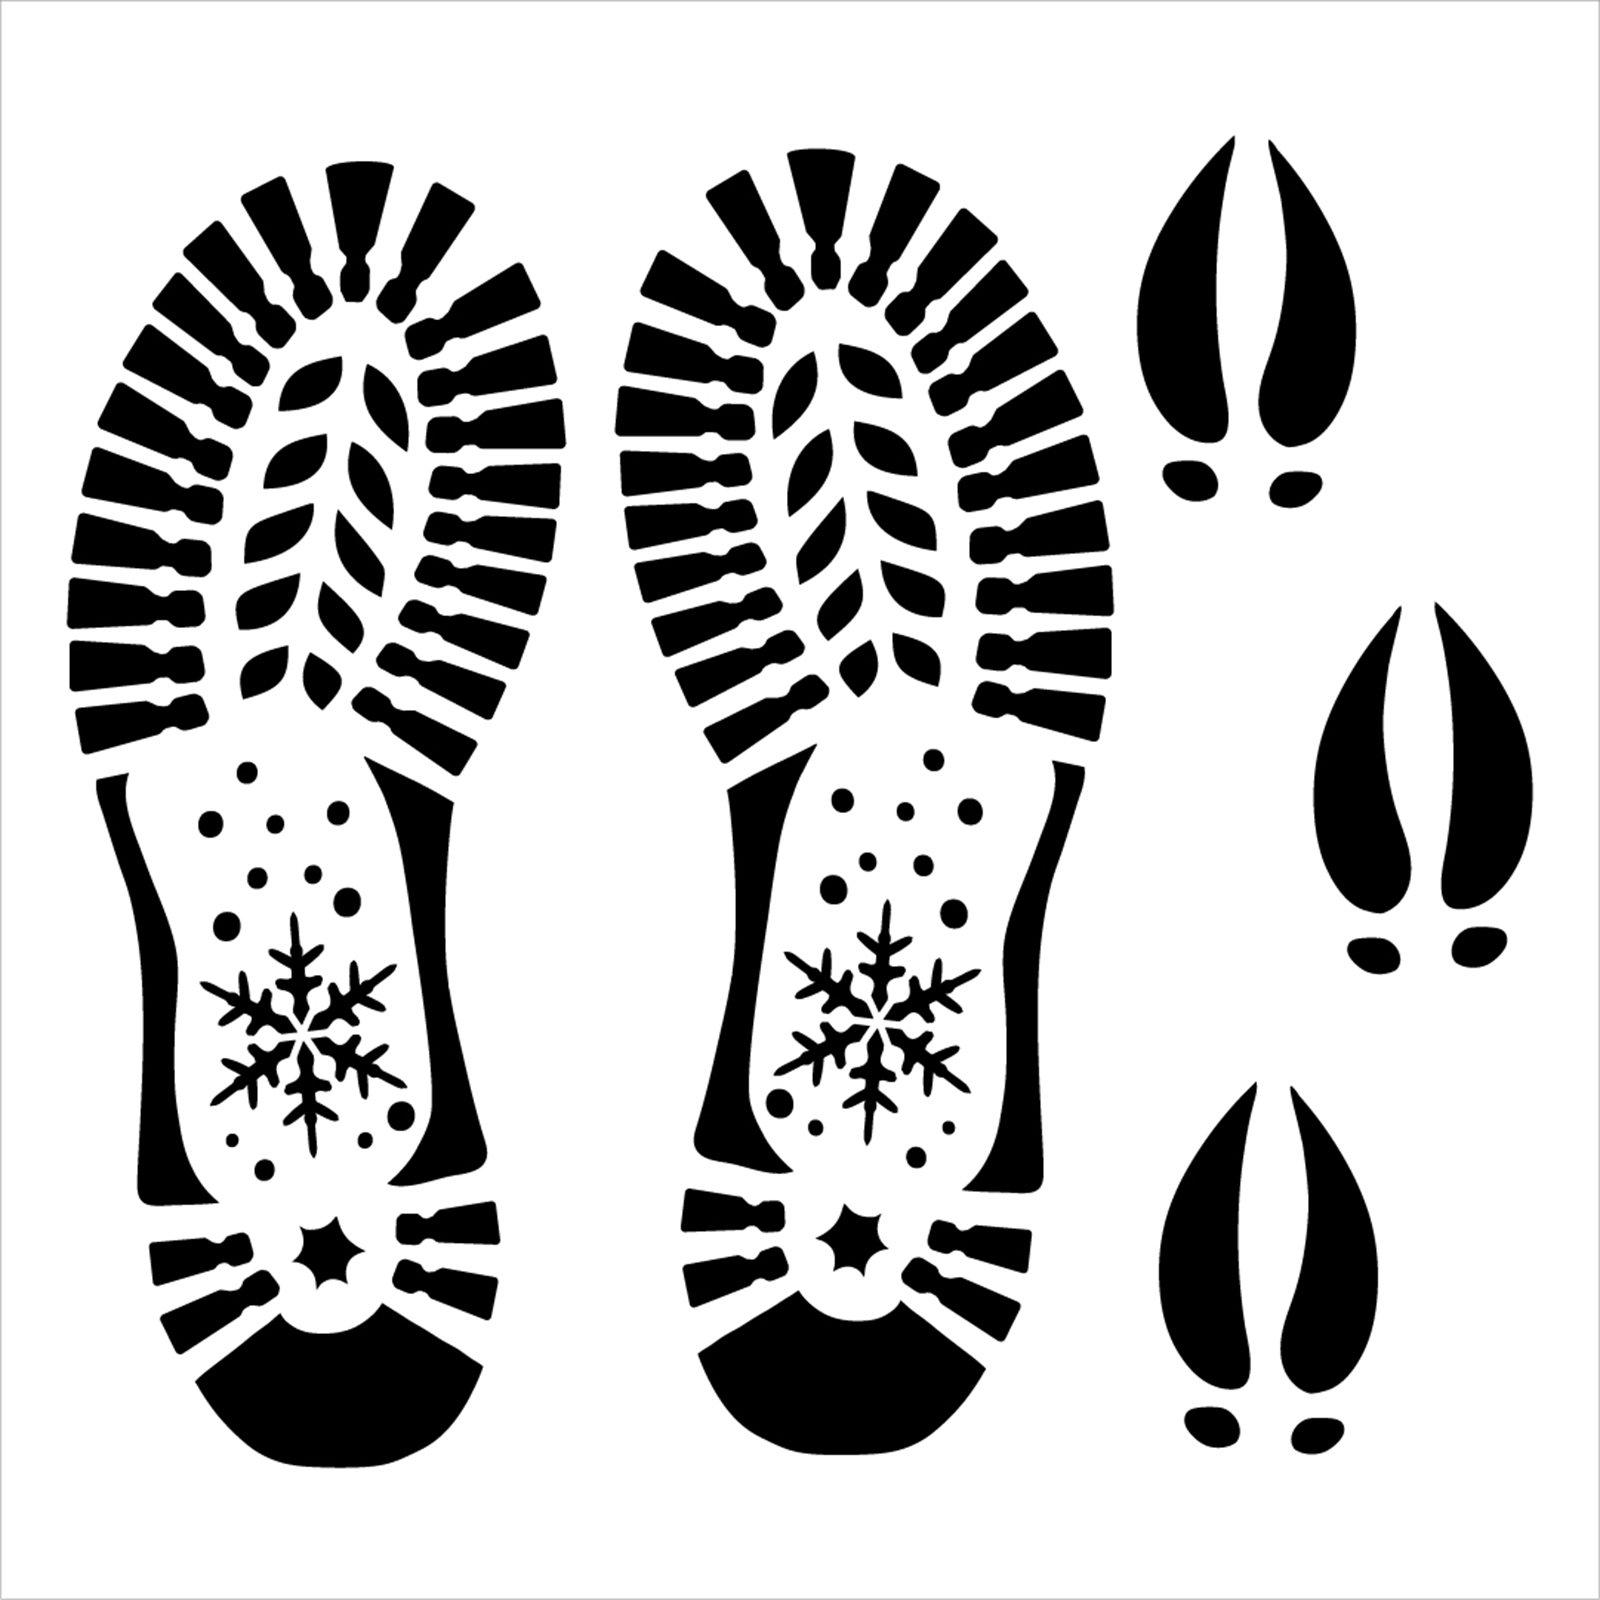 Santa Boot Reindeer Hoof Print Stencil by StudioR12 | Craft DIY Christmas Holiday Home Decor | Paint Wood Sign | Reusable Mylar Template | Select Size